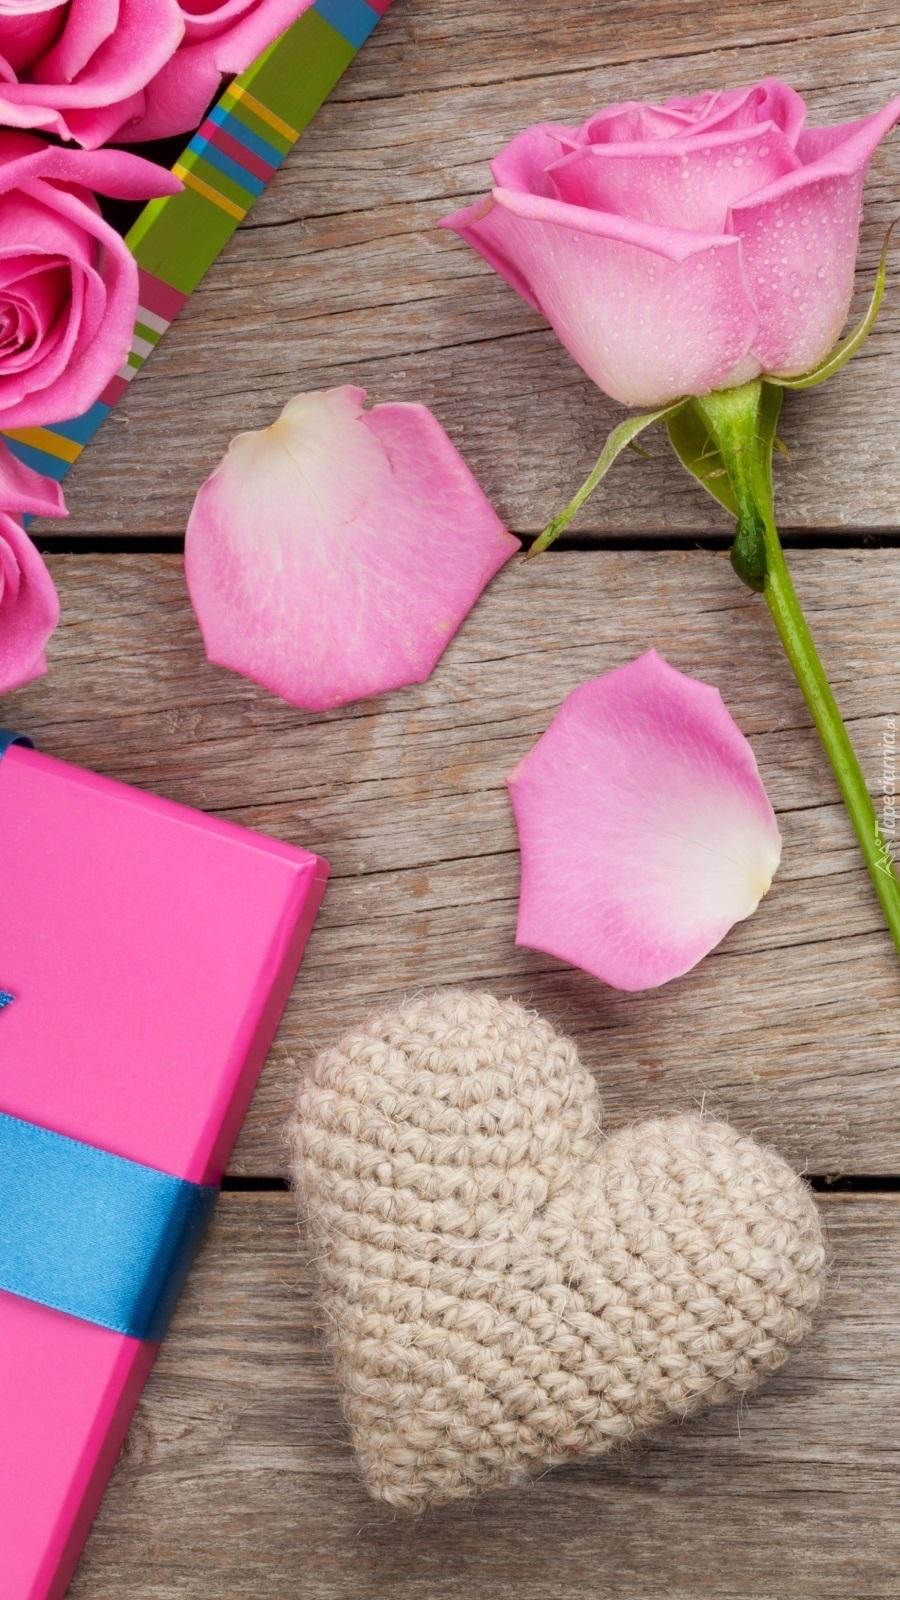 Róża i serduszko na deskach